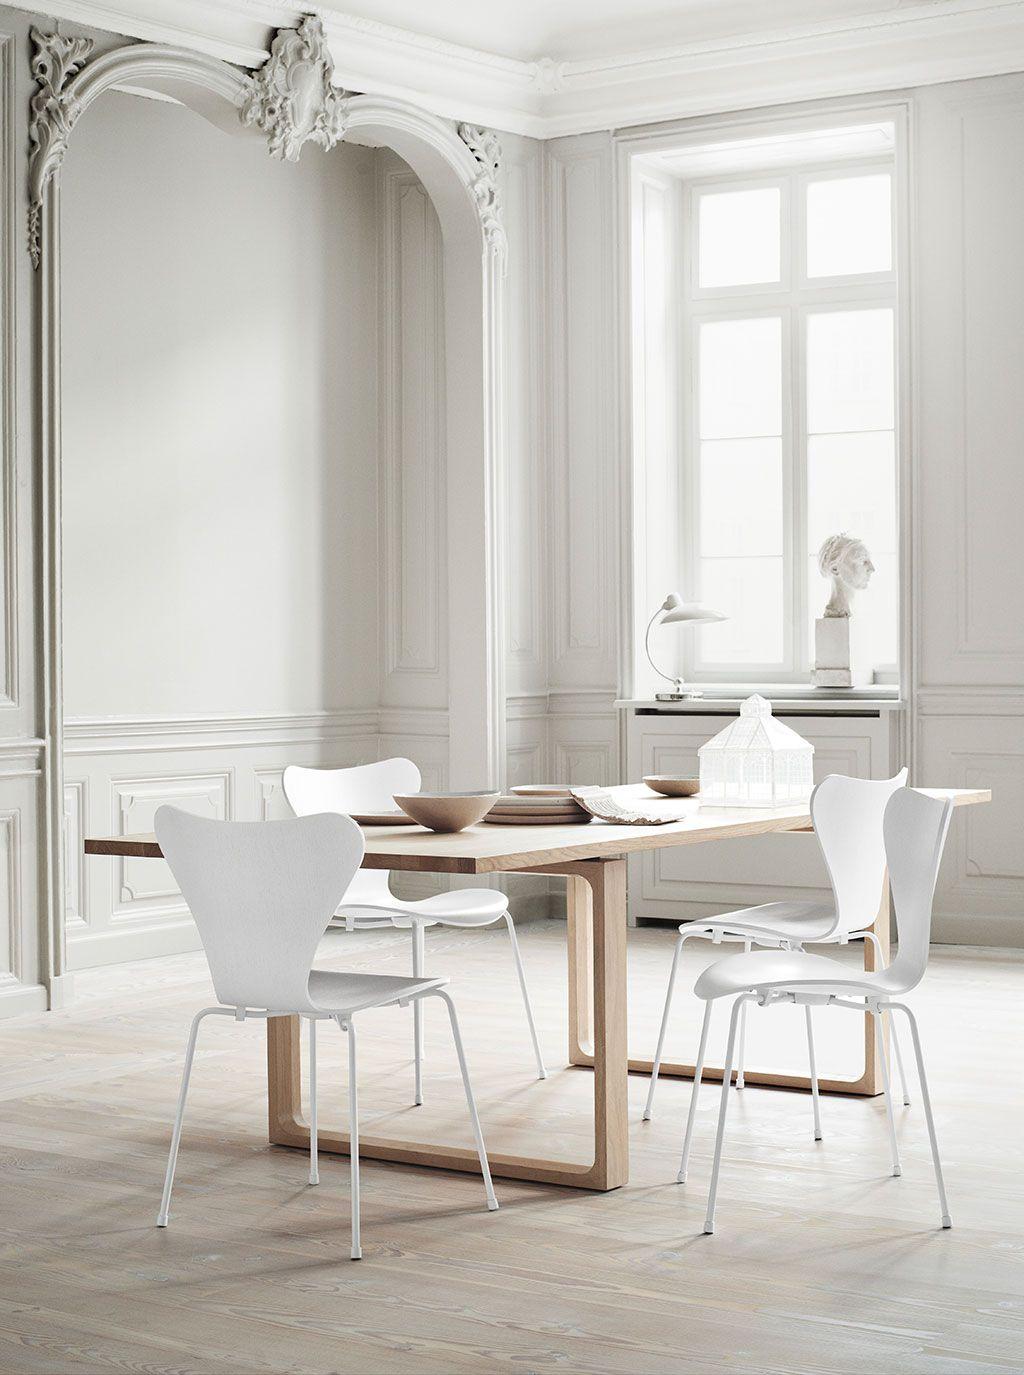 Designer Arne Jacobsens Siebener Stuhl, Auch Bekannt Als Modell 3107. ...